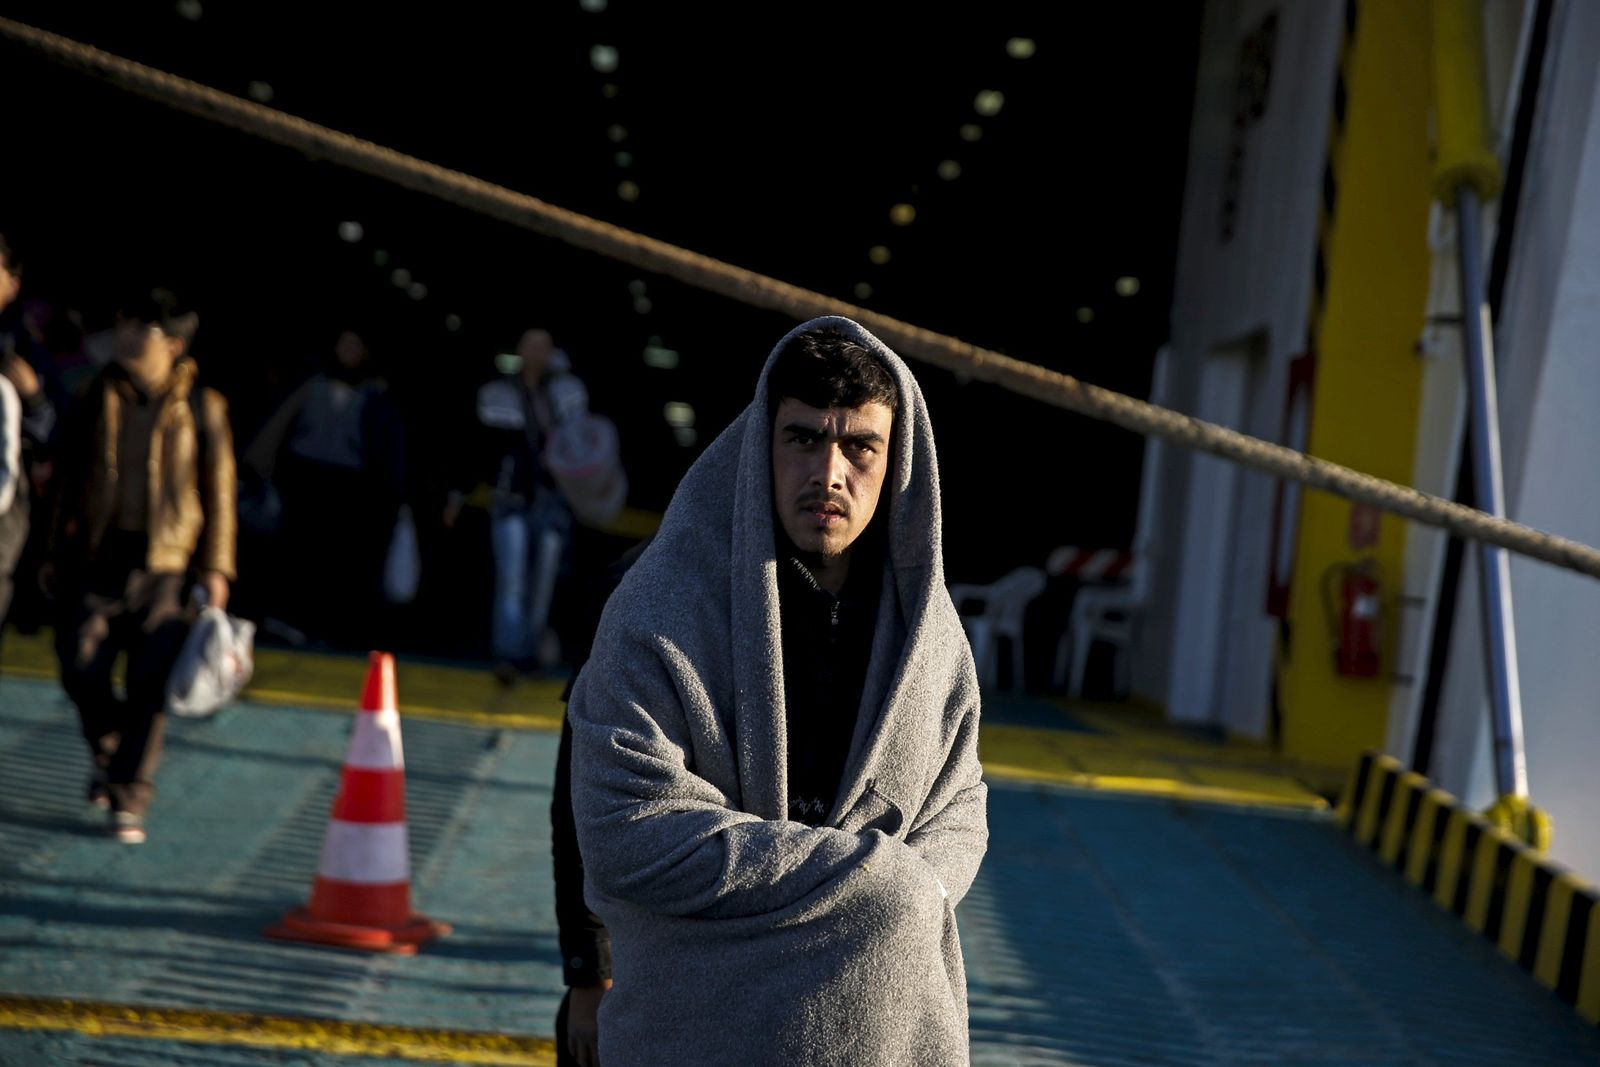 Flüchtlinge/Griechenland